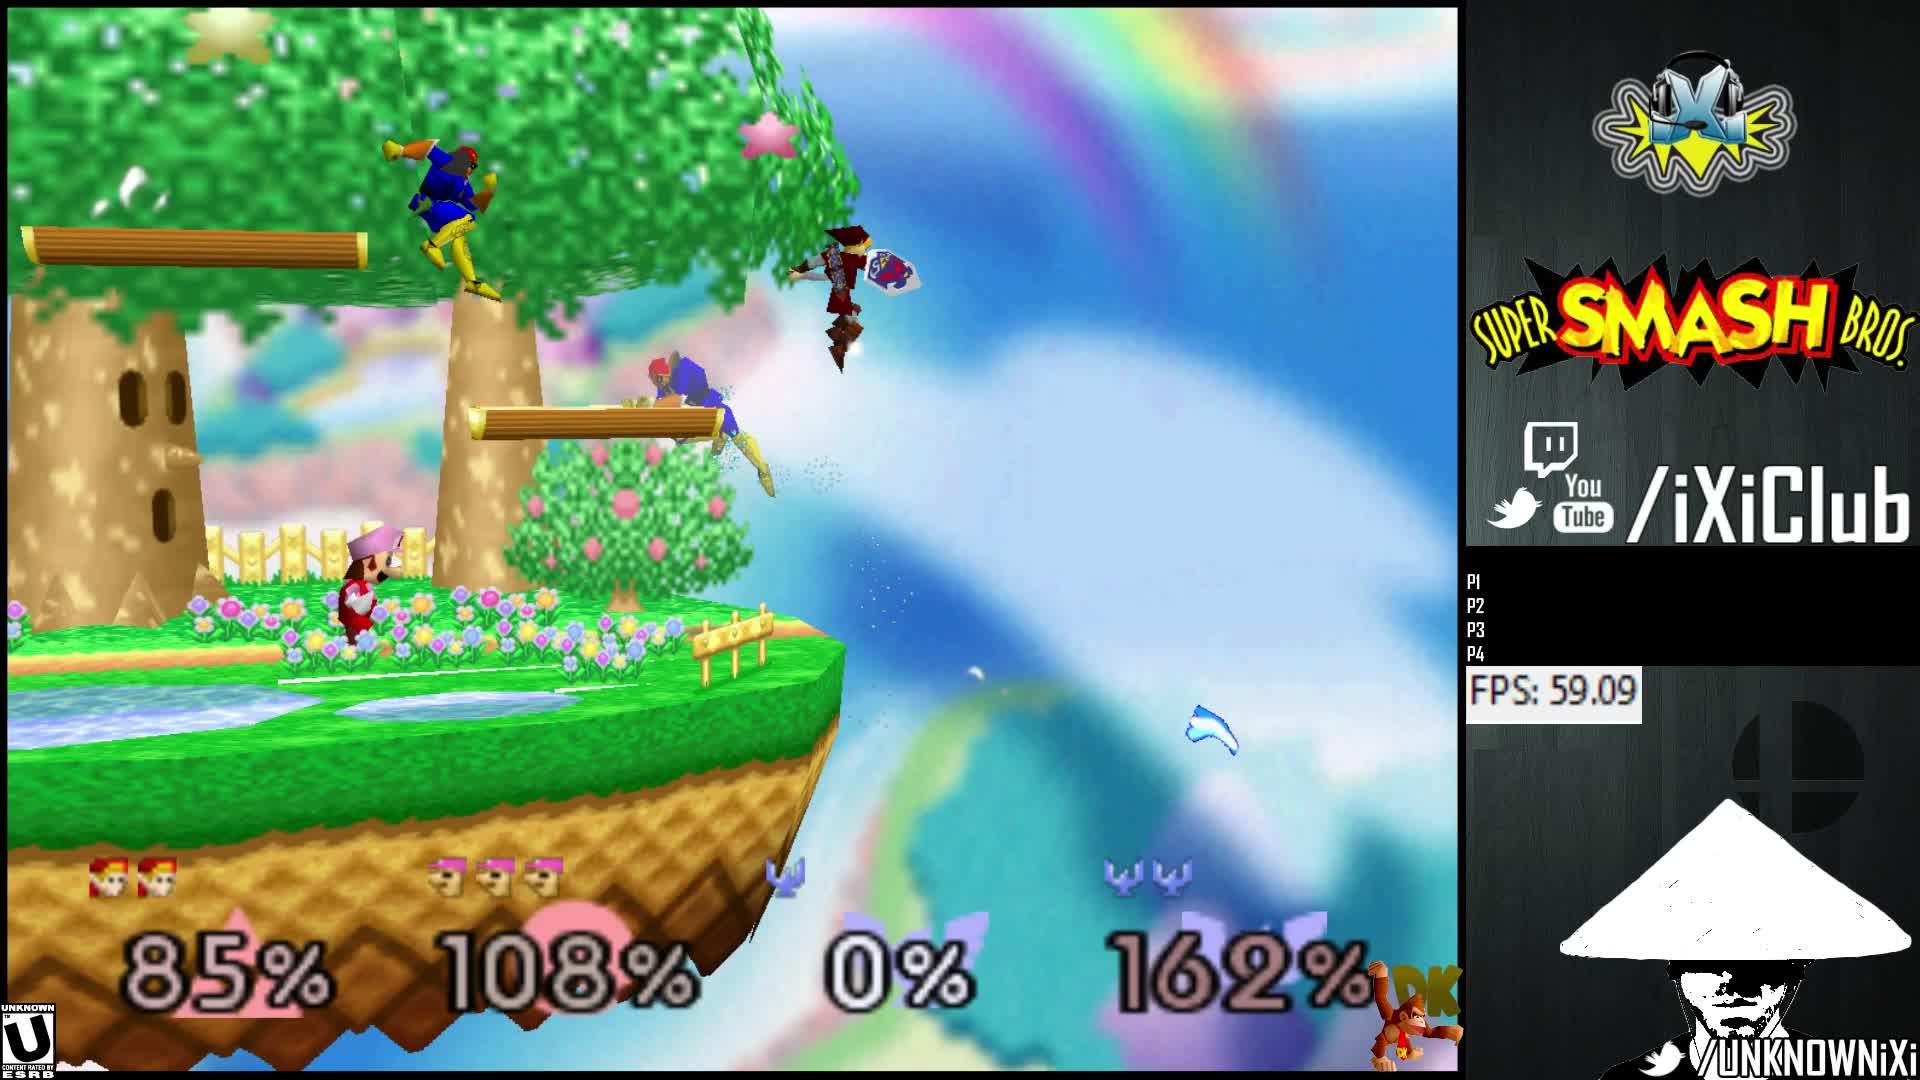 smashgifs, TEAMS Foolery with Link Bombs, Falcons, Luigi GIFs